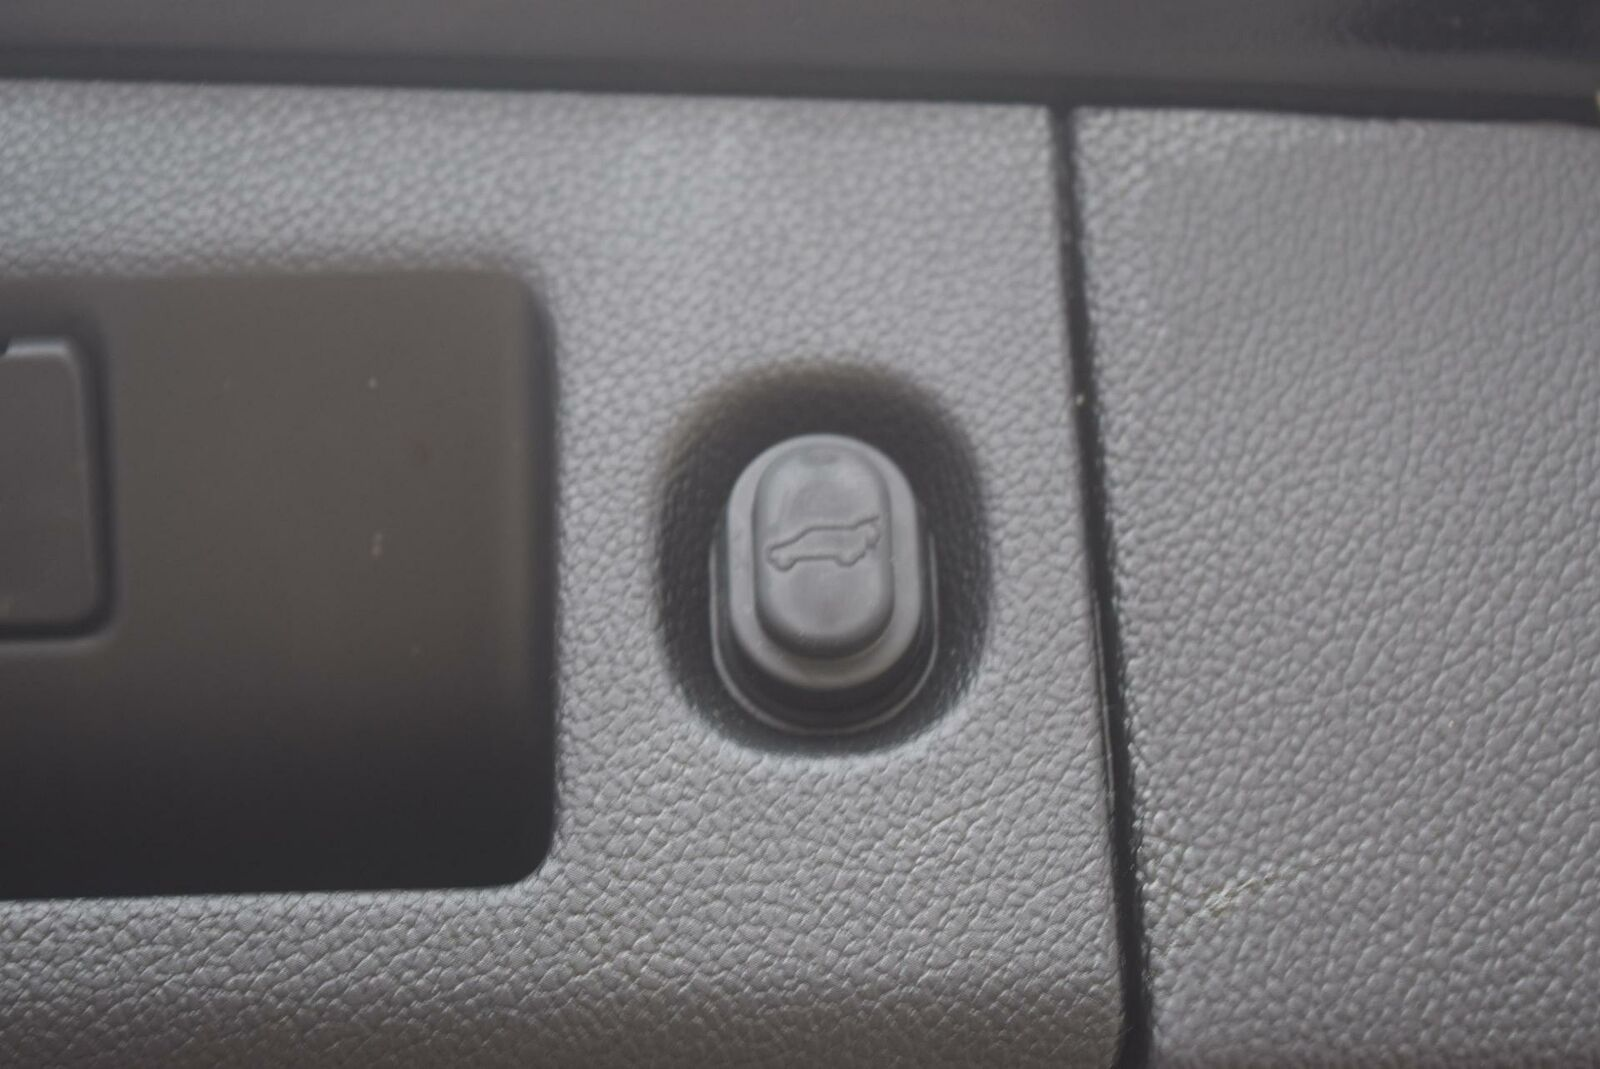 Chevrolet Suburban 2019 photo 11